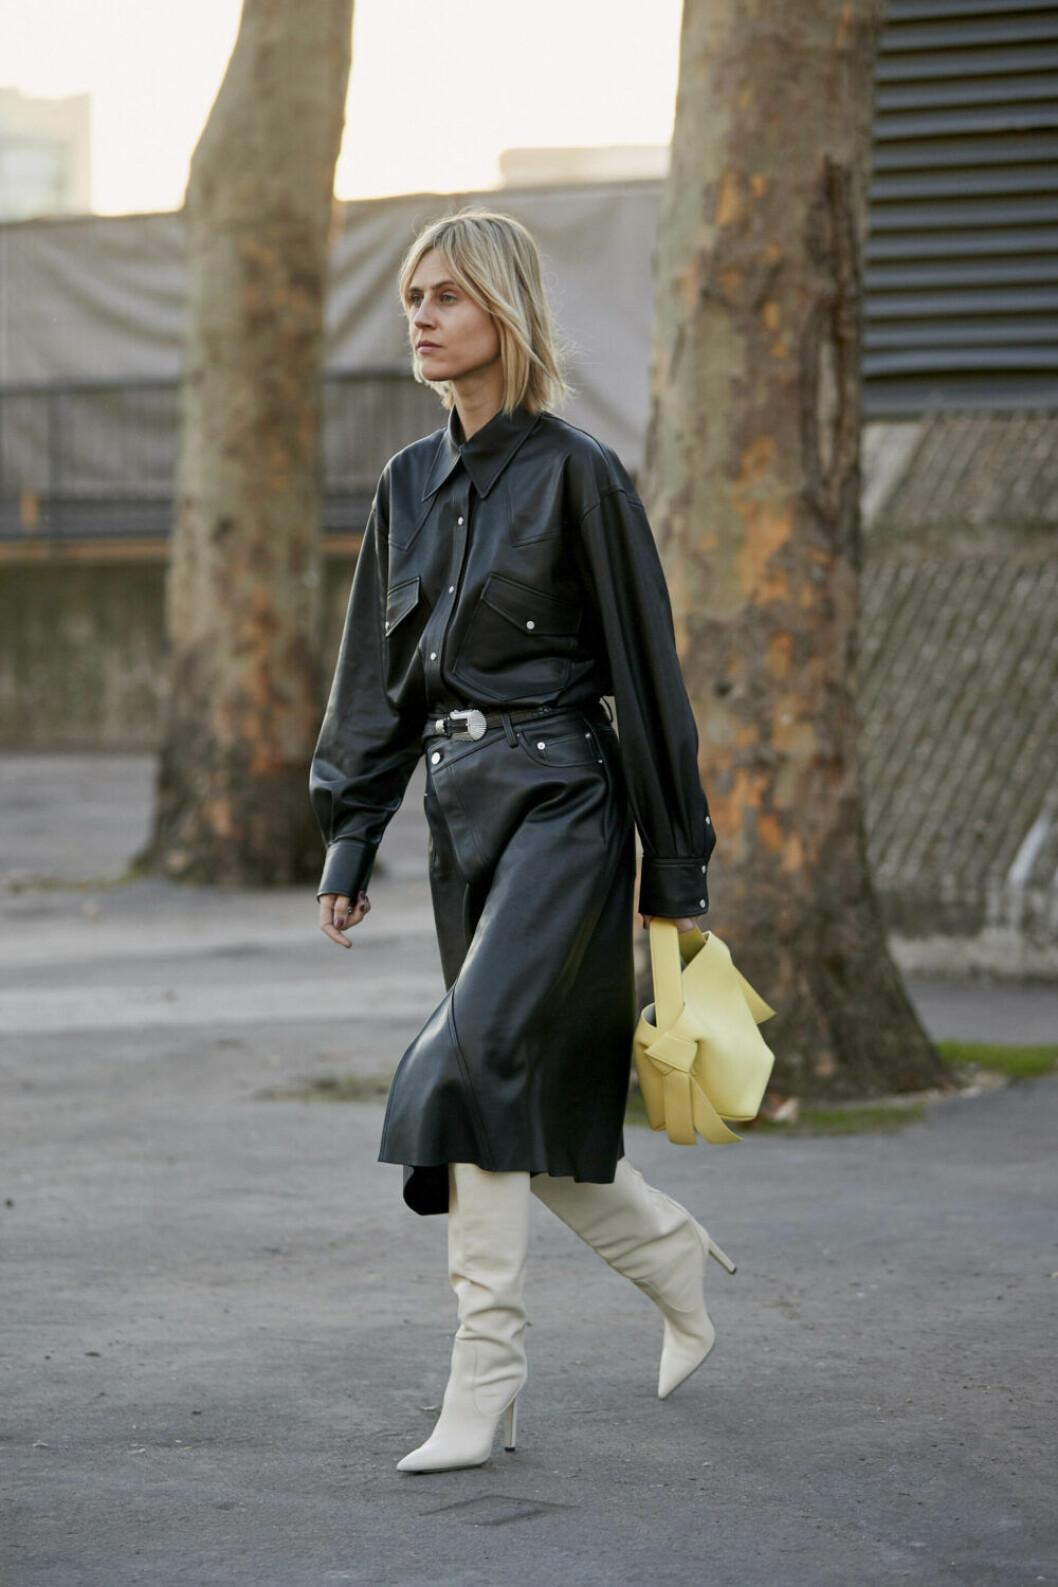 Streetstyle Paris FW, svart look i skinn.